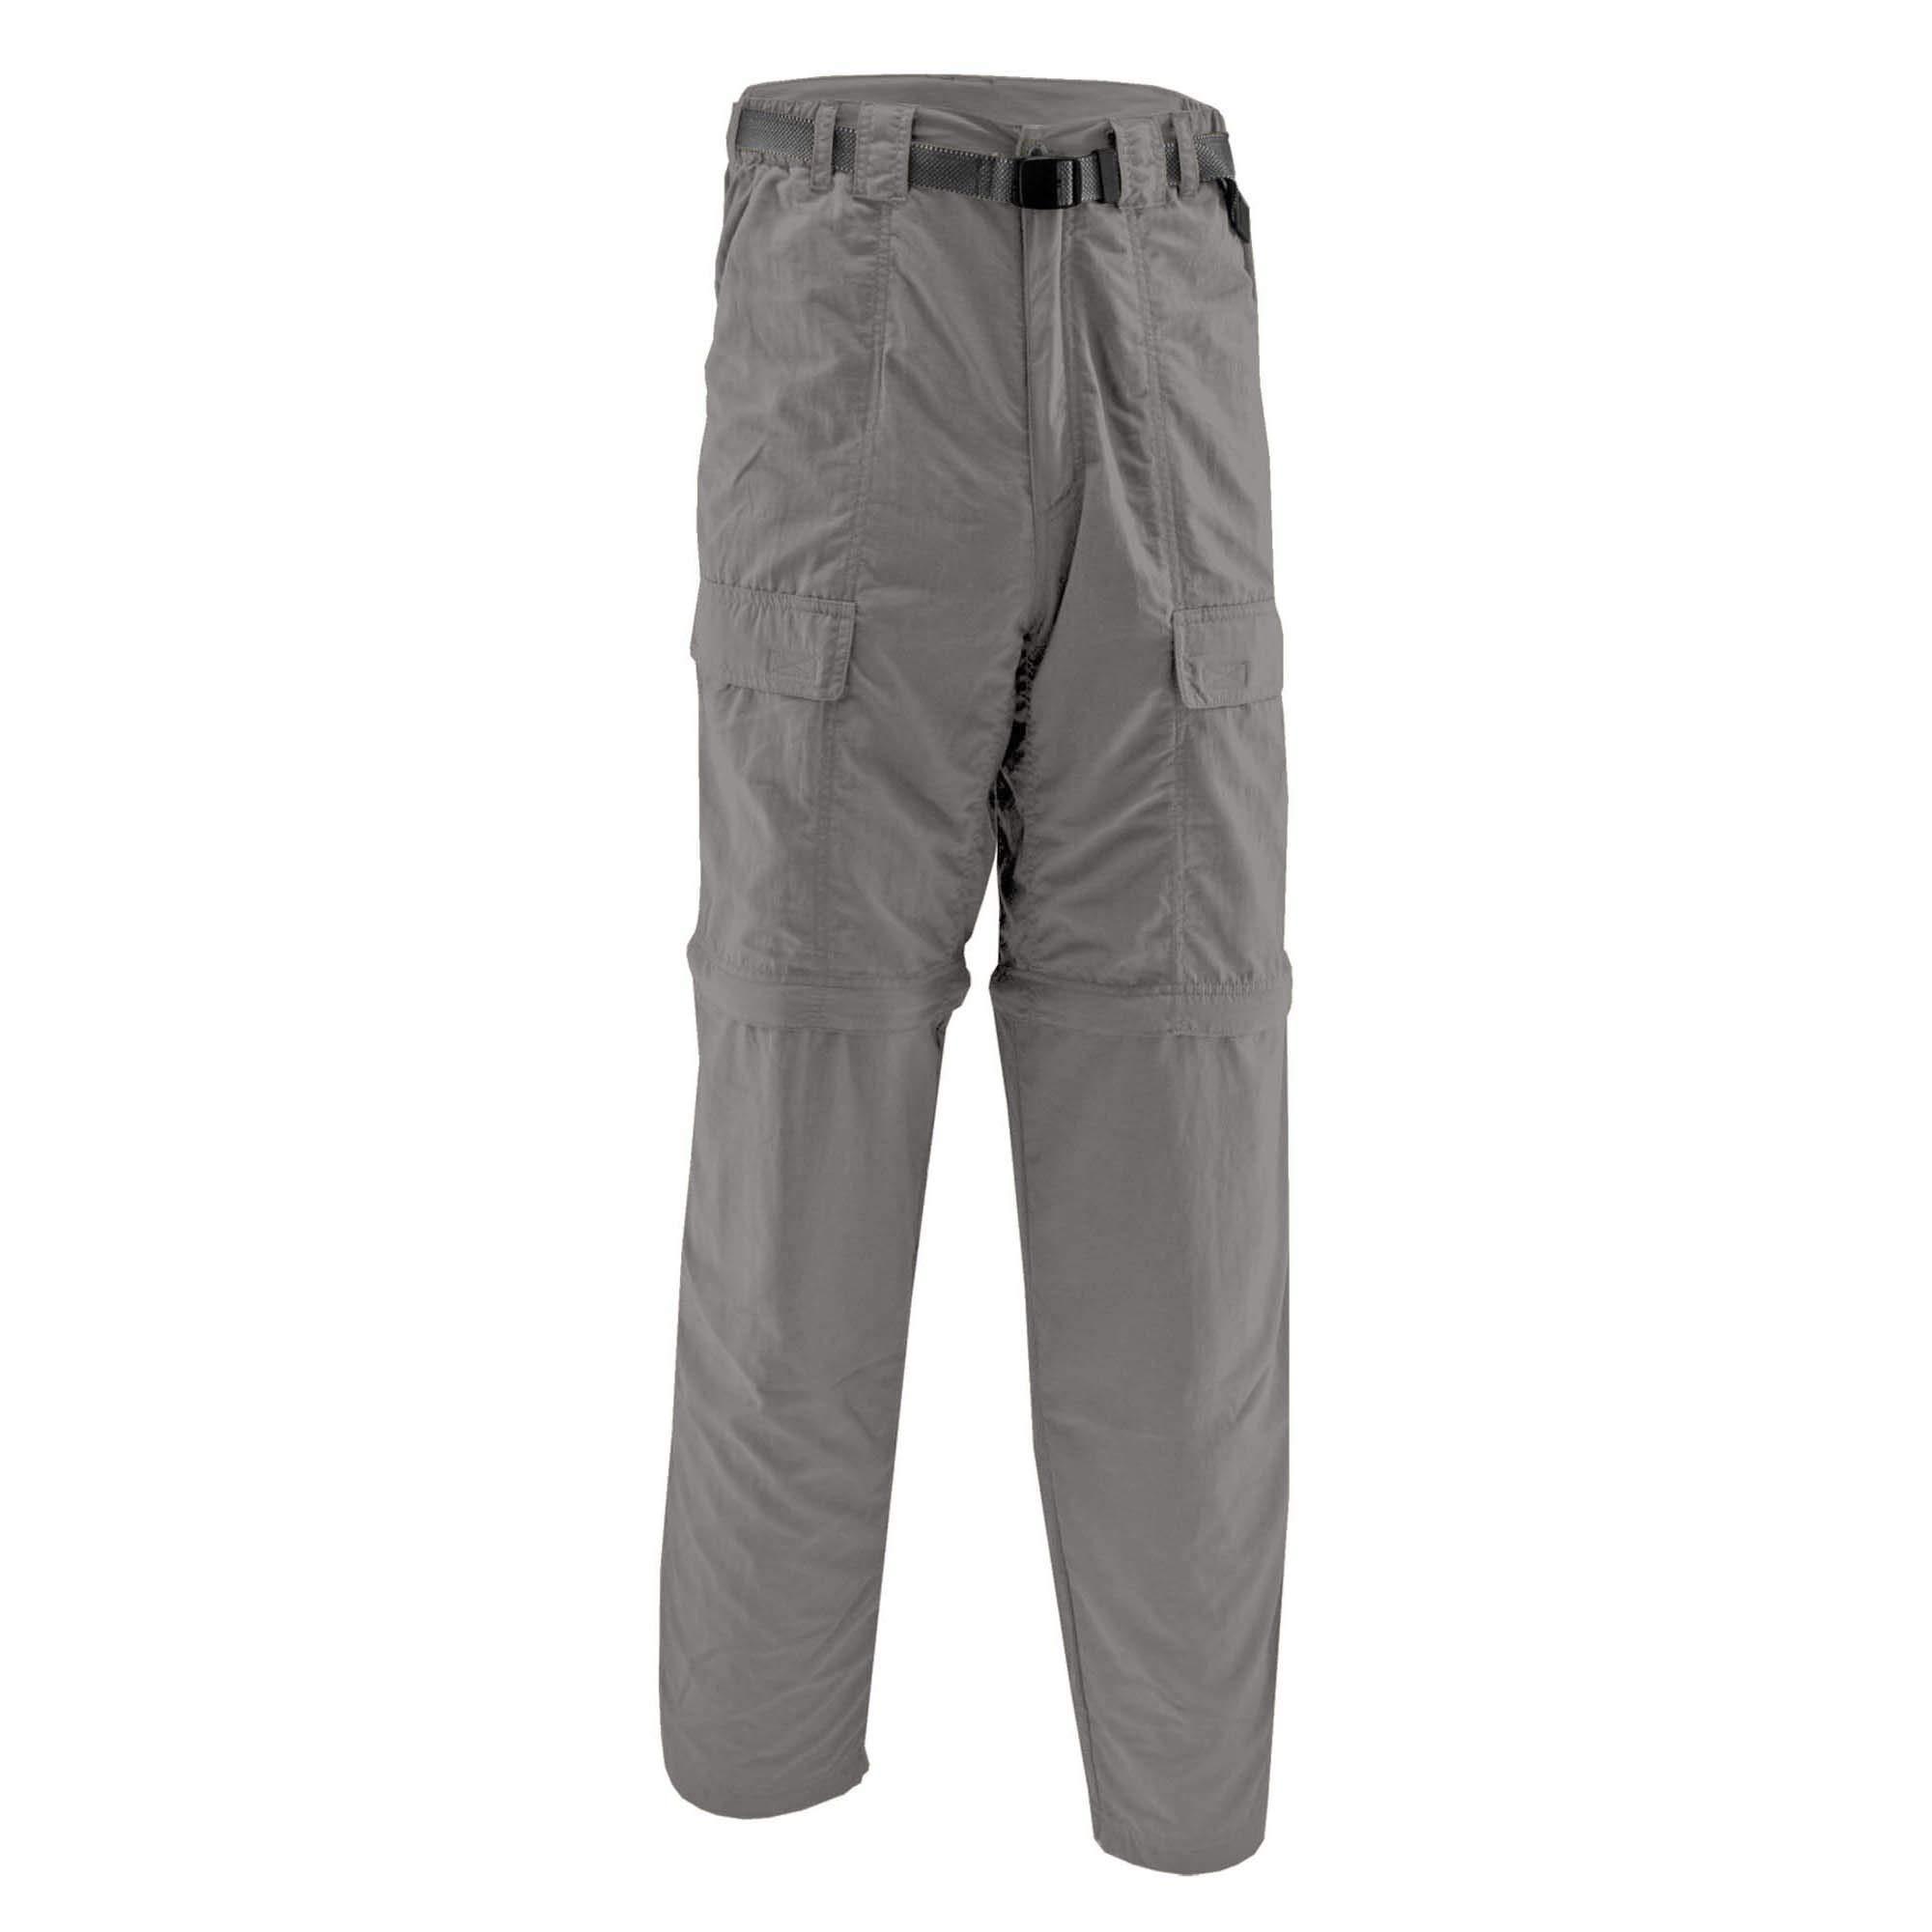 White Sierra Men's Trail Convertible Pant 30'' (Large, Brushed Nickel)